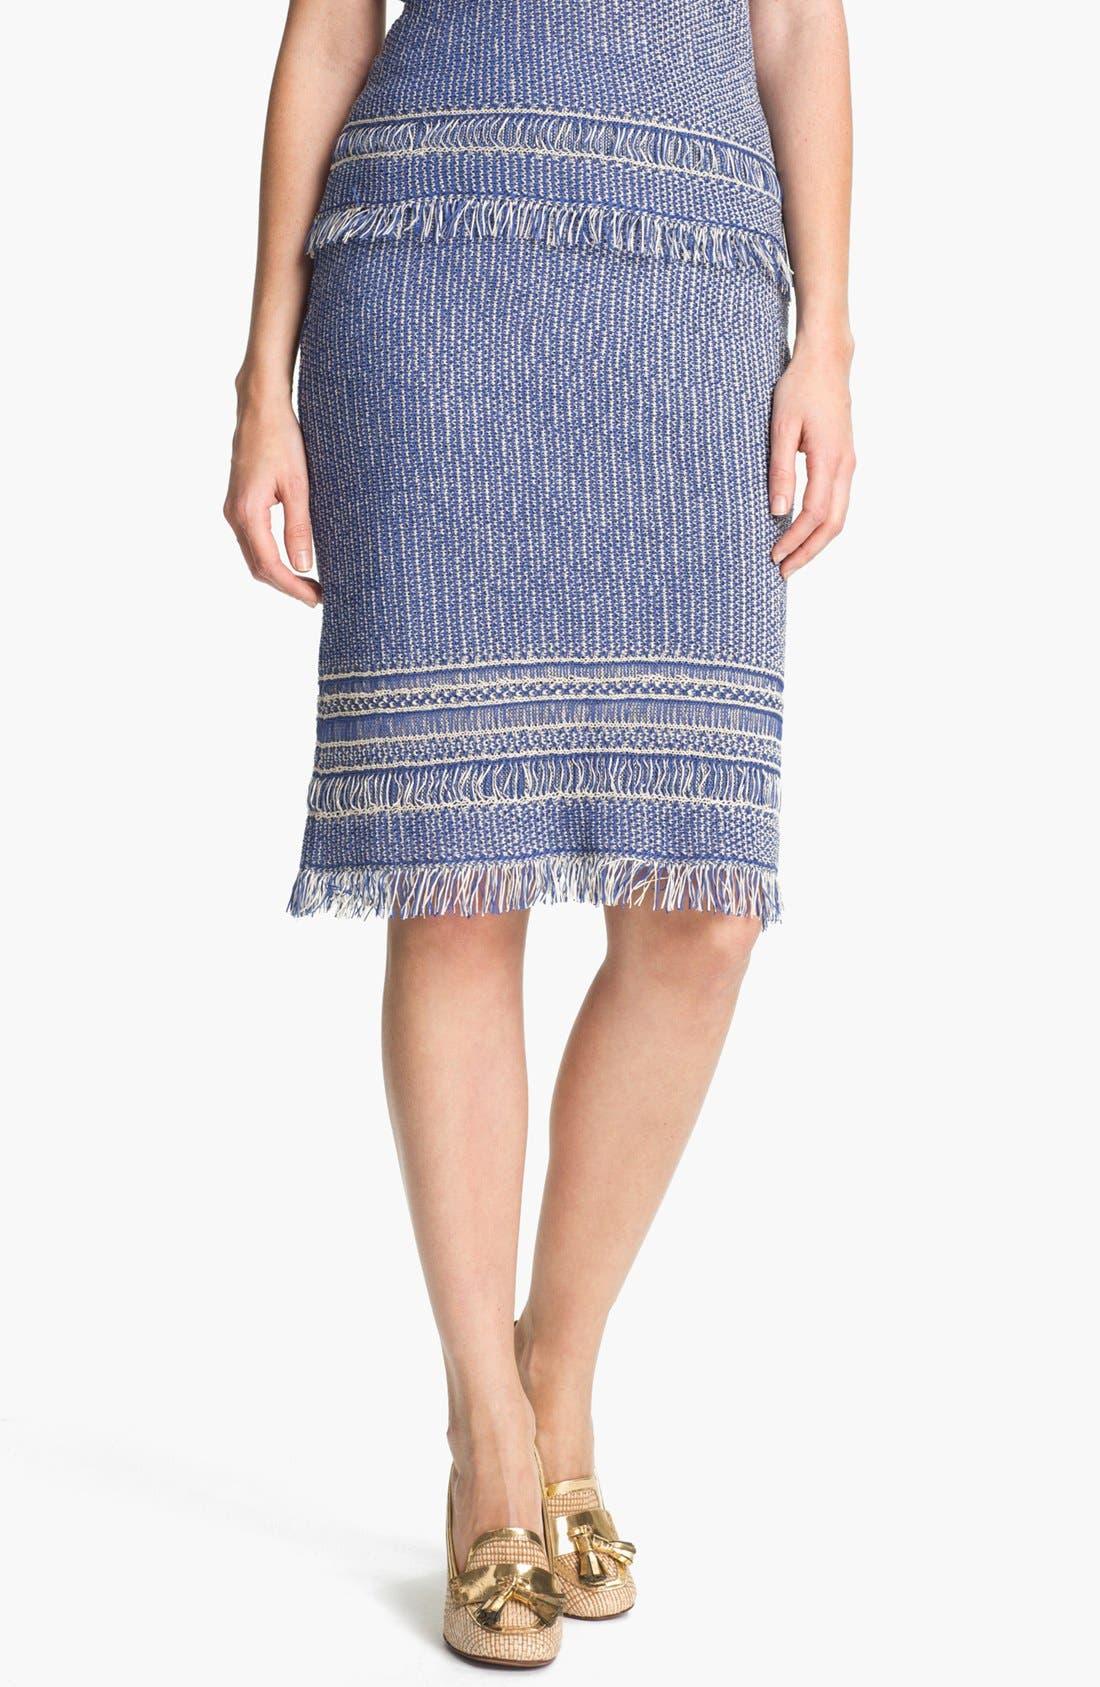 Main Image - Tory Burch 'Brielle' Skirt